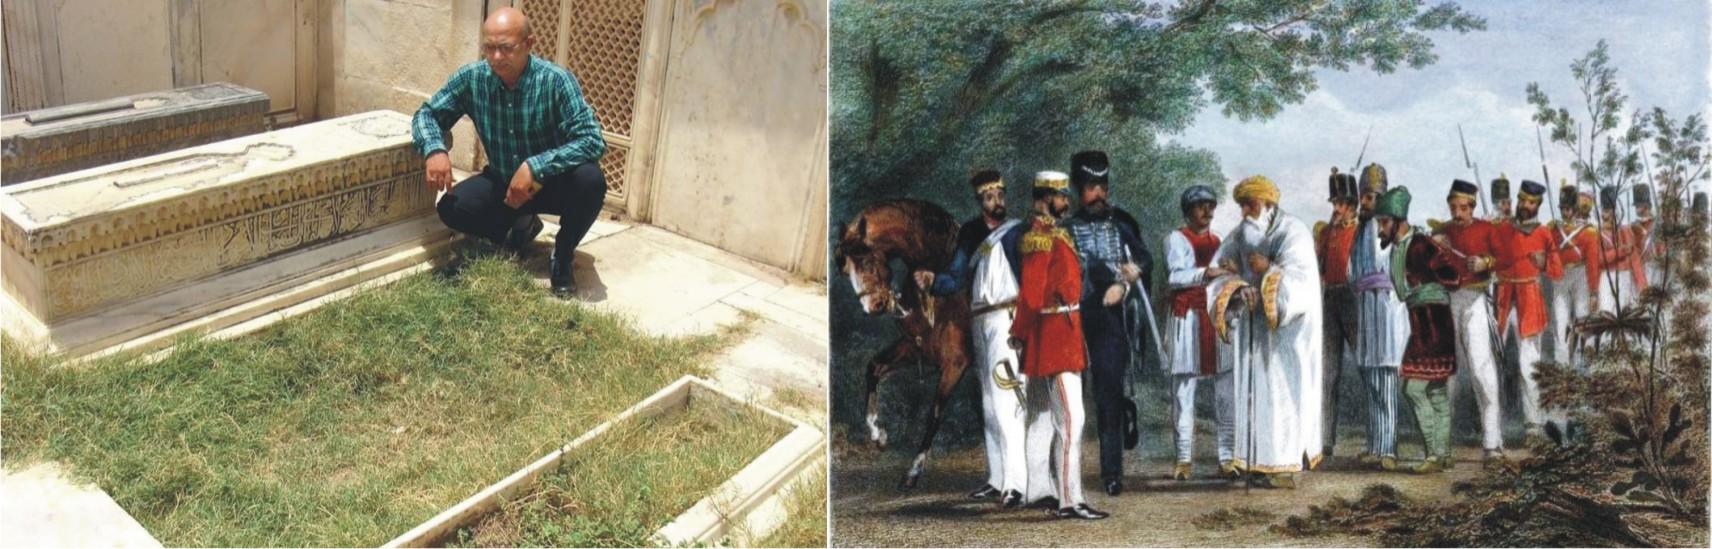 Campaign to bury Bahadur Shah Zafar at Mehrauli